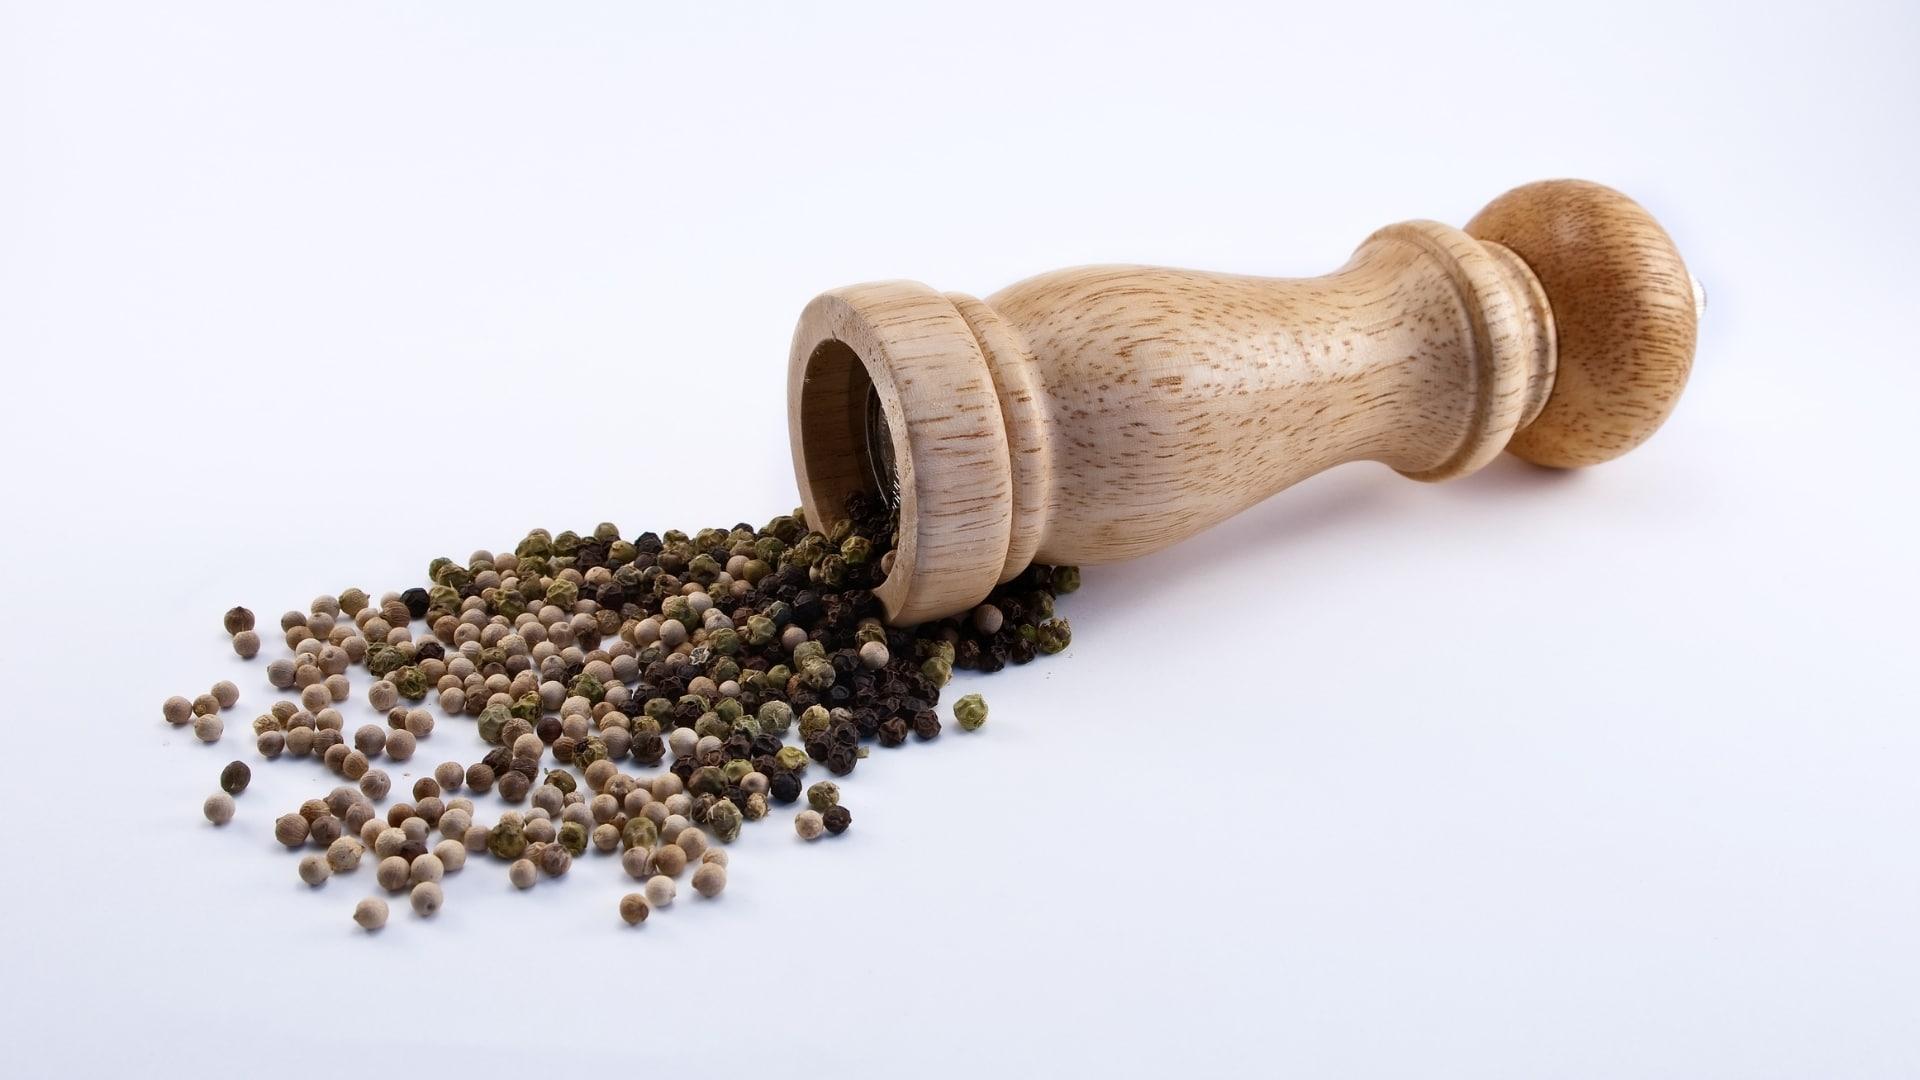 The 10 Best Pepper Mills